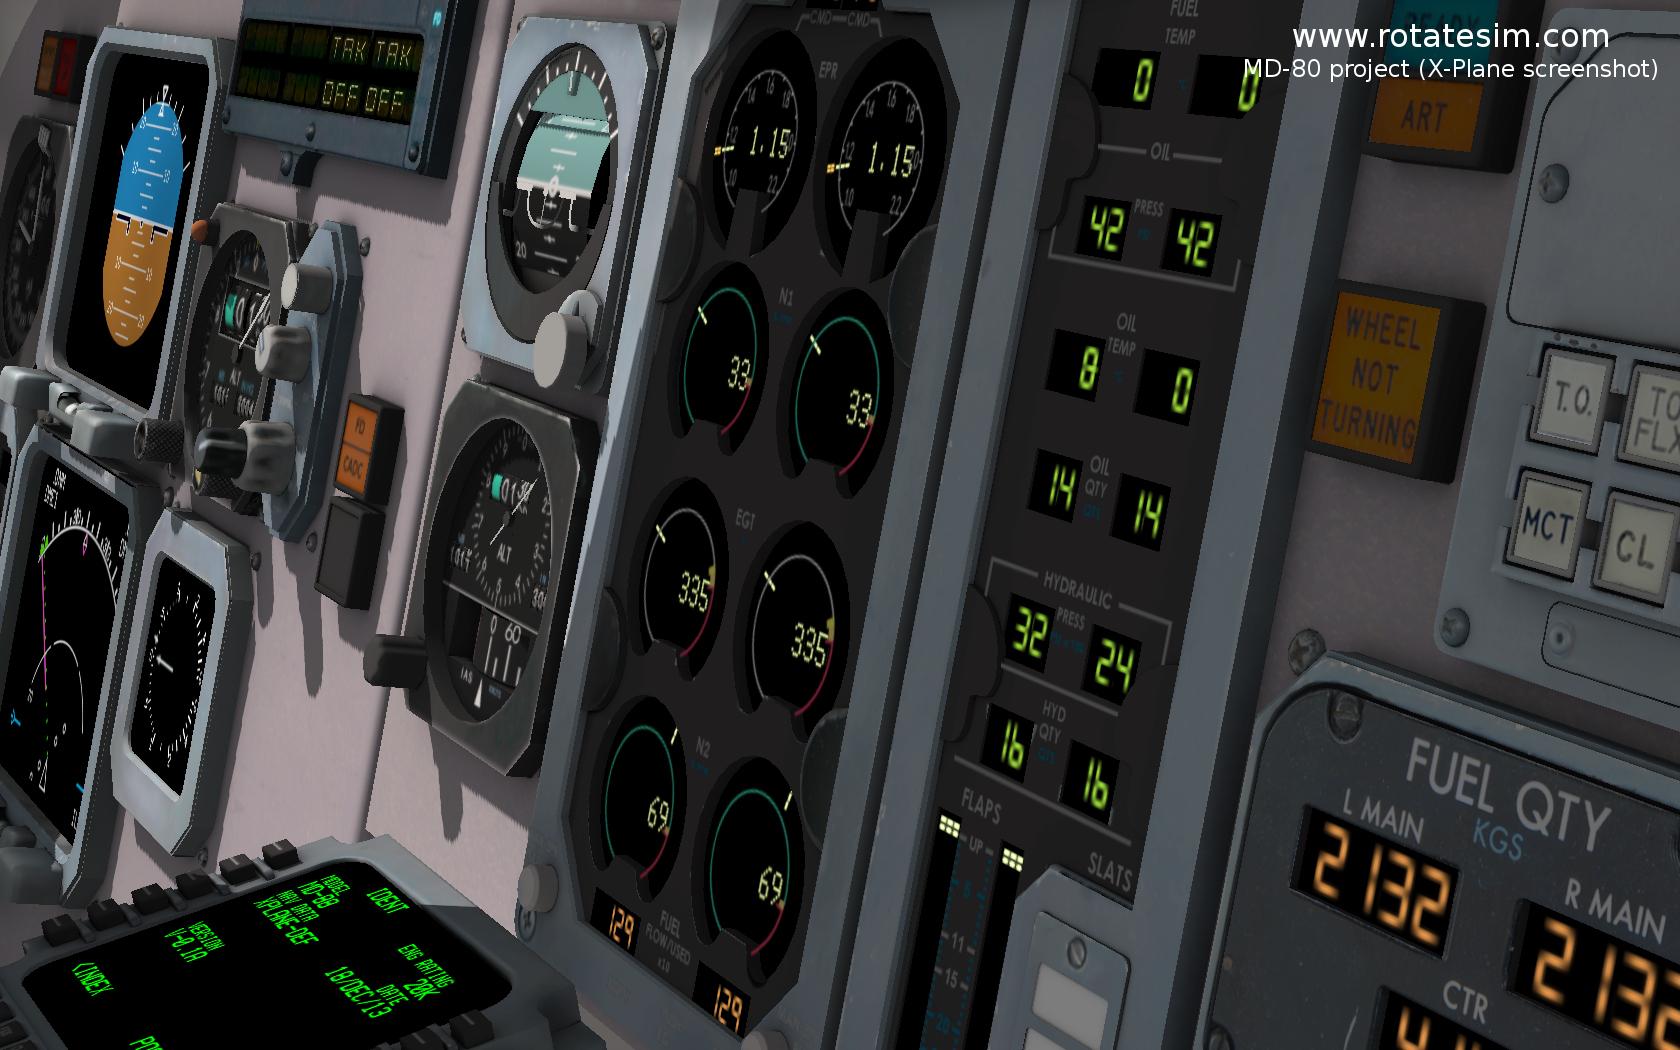 XP10 - Mc. Douglas MD-80 MD80-screenshot-011